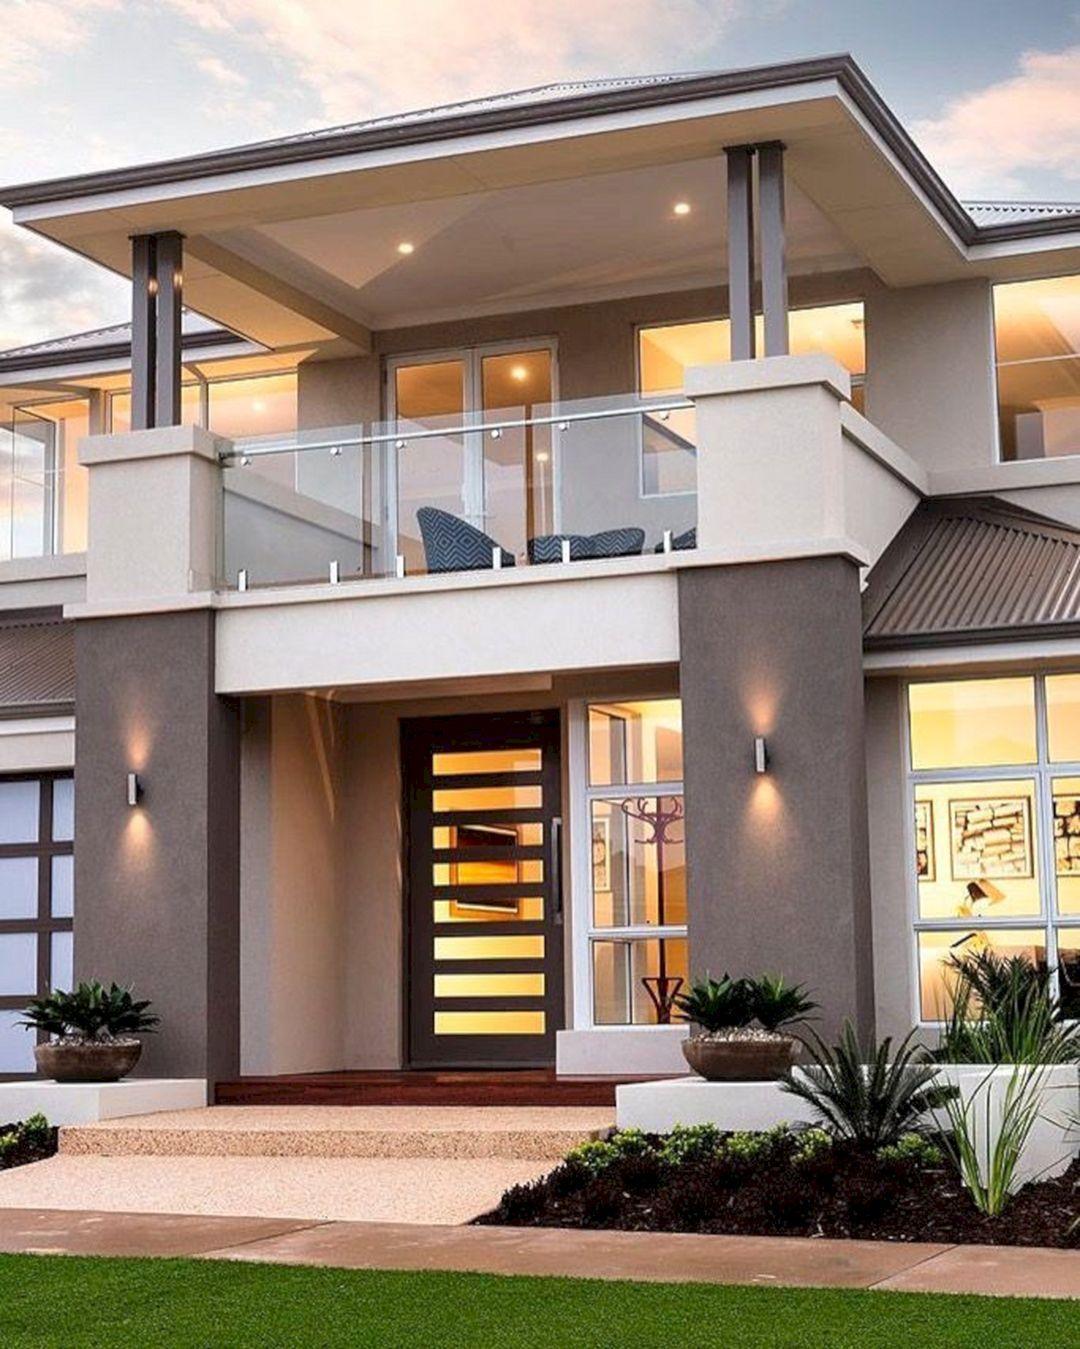 Modern Home Design Ideas Exterior: Find Great Exterior Design Ideas For Modern Home !